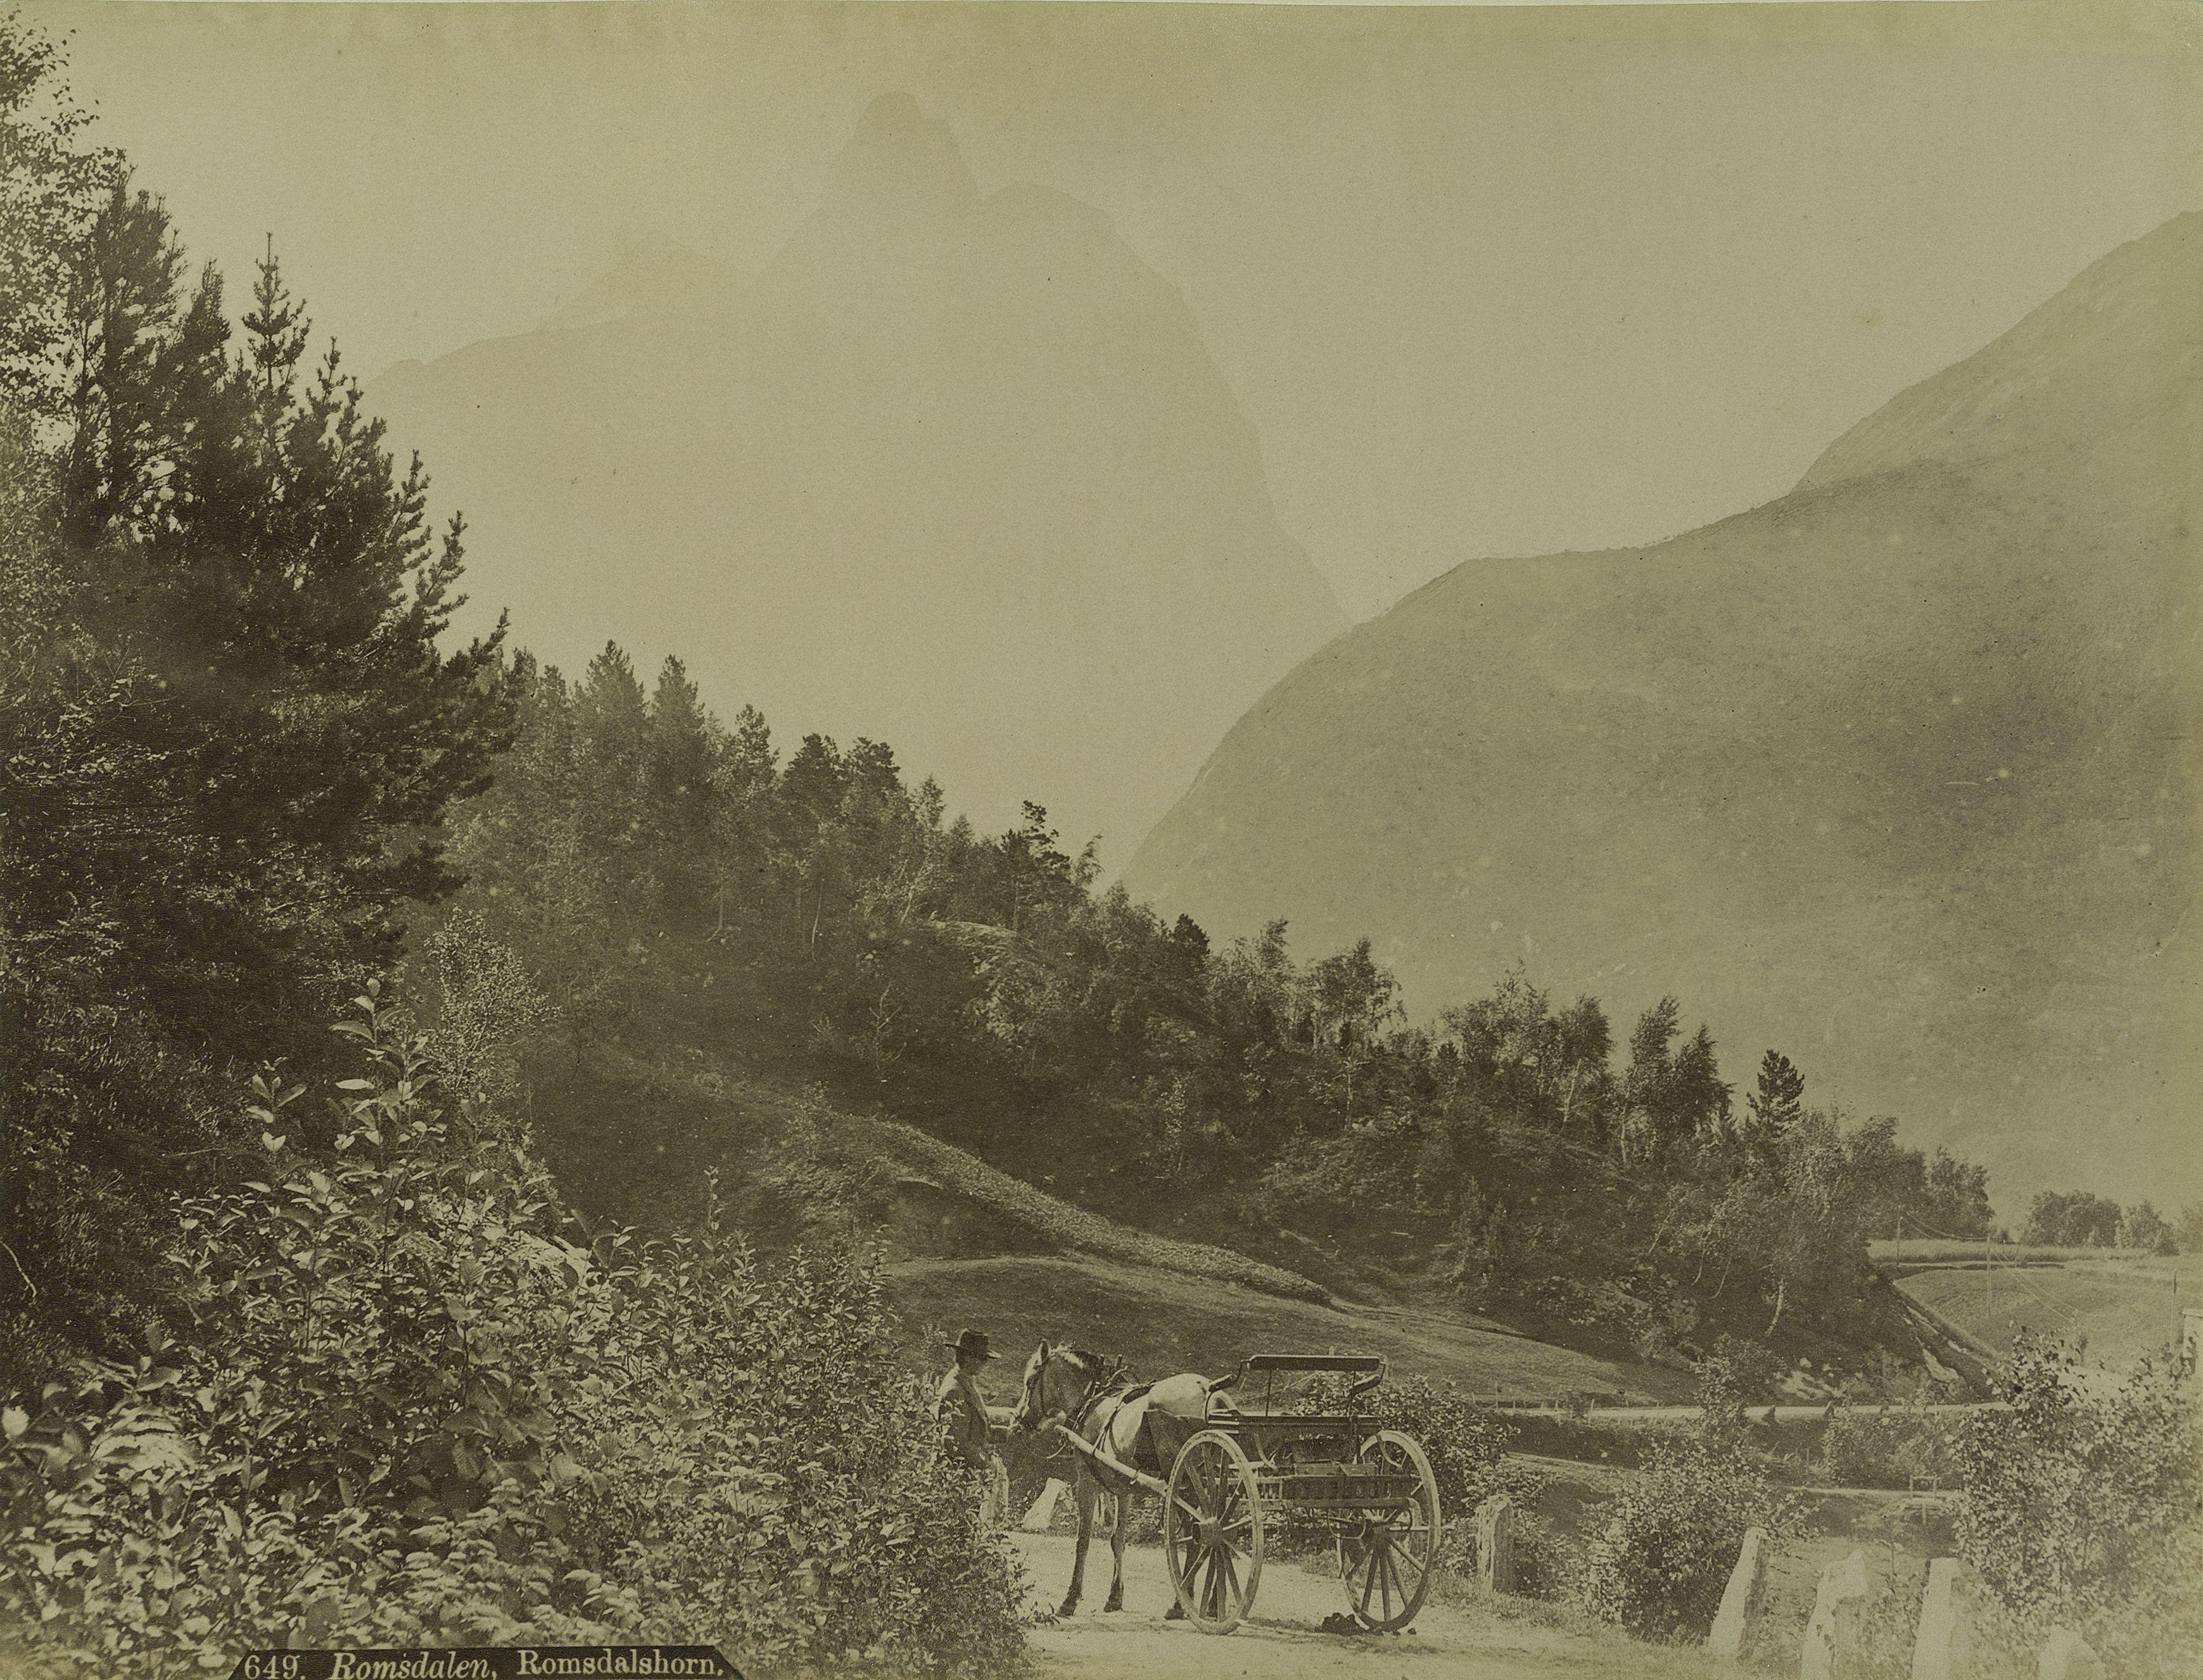 Норвегия. Мёре-ог-Ромсдал, гора  Ромсдальхорн